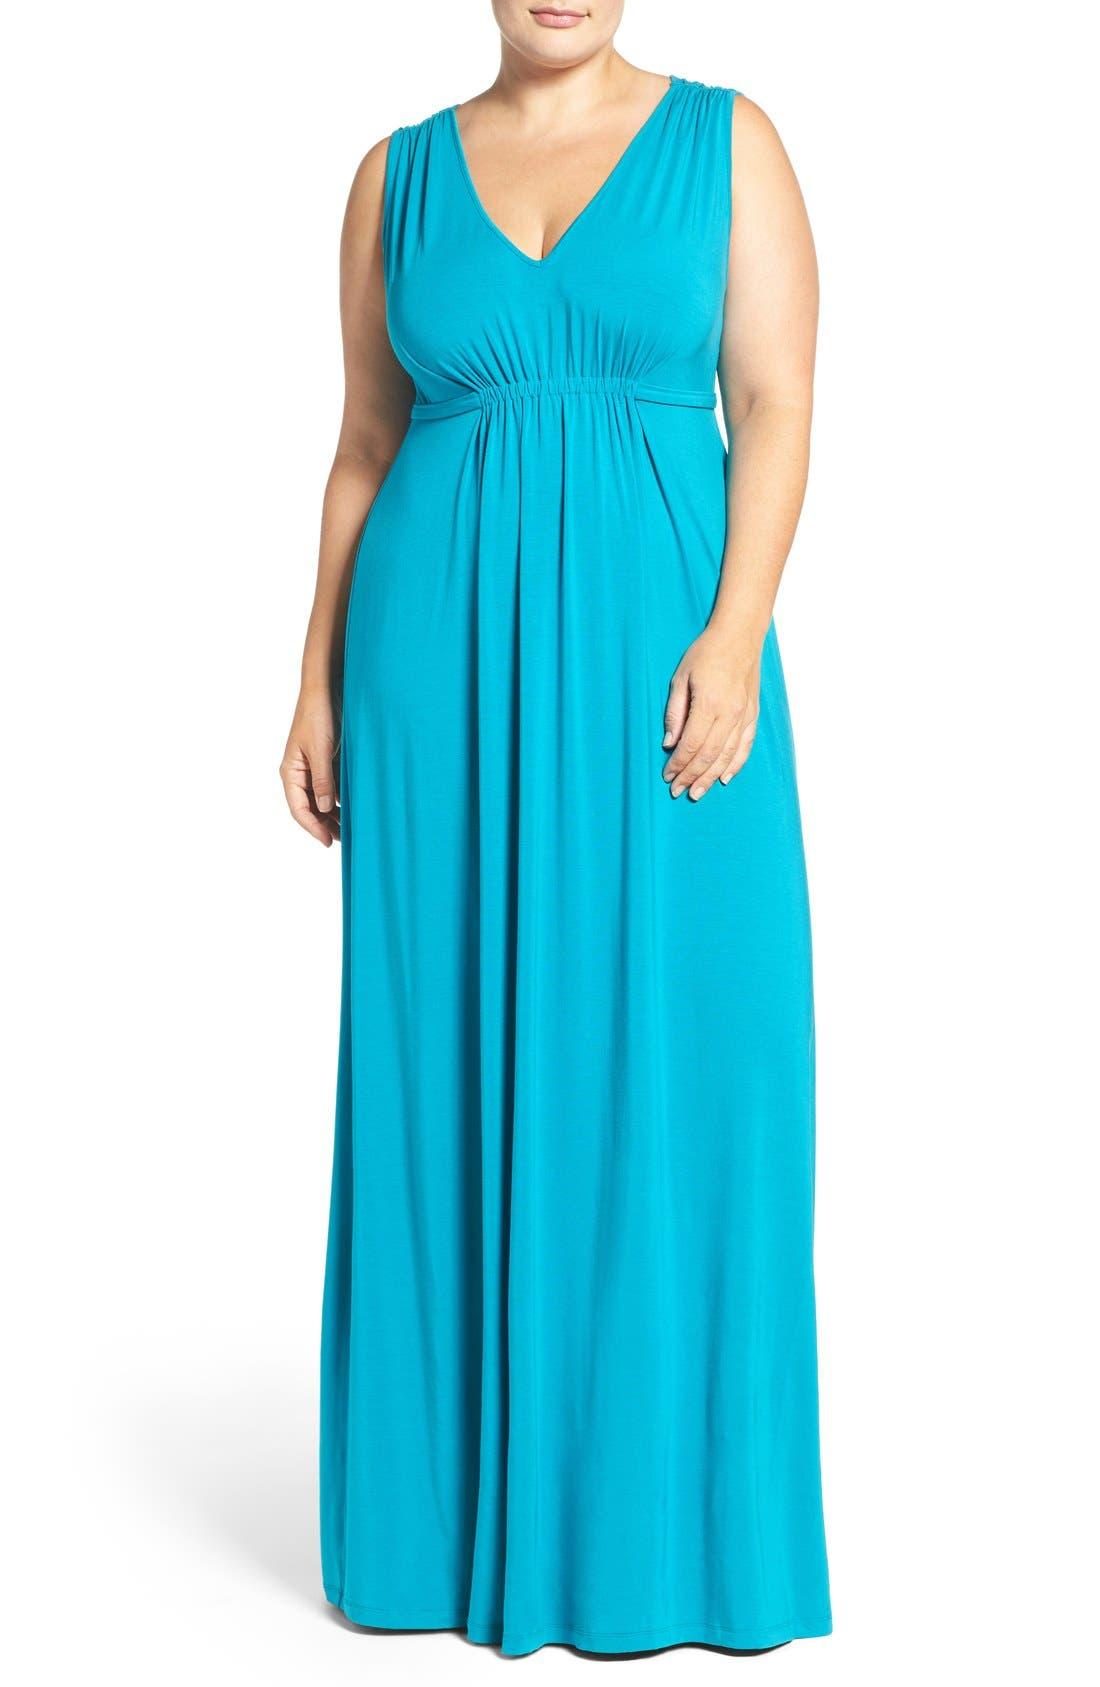 Main Image - Tart Grecia Sleeveless Jersey Maxi Dress (Plus Size)